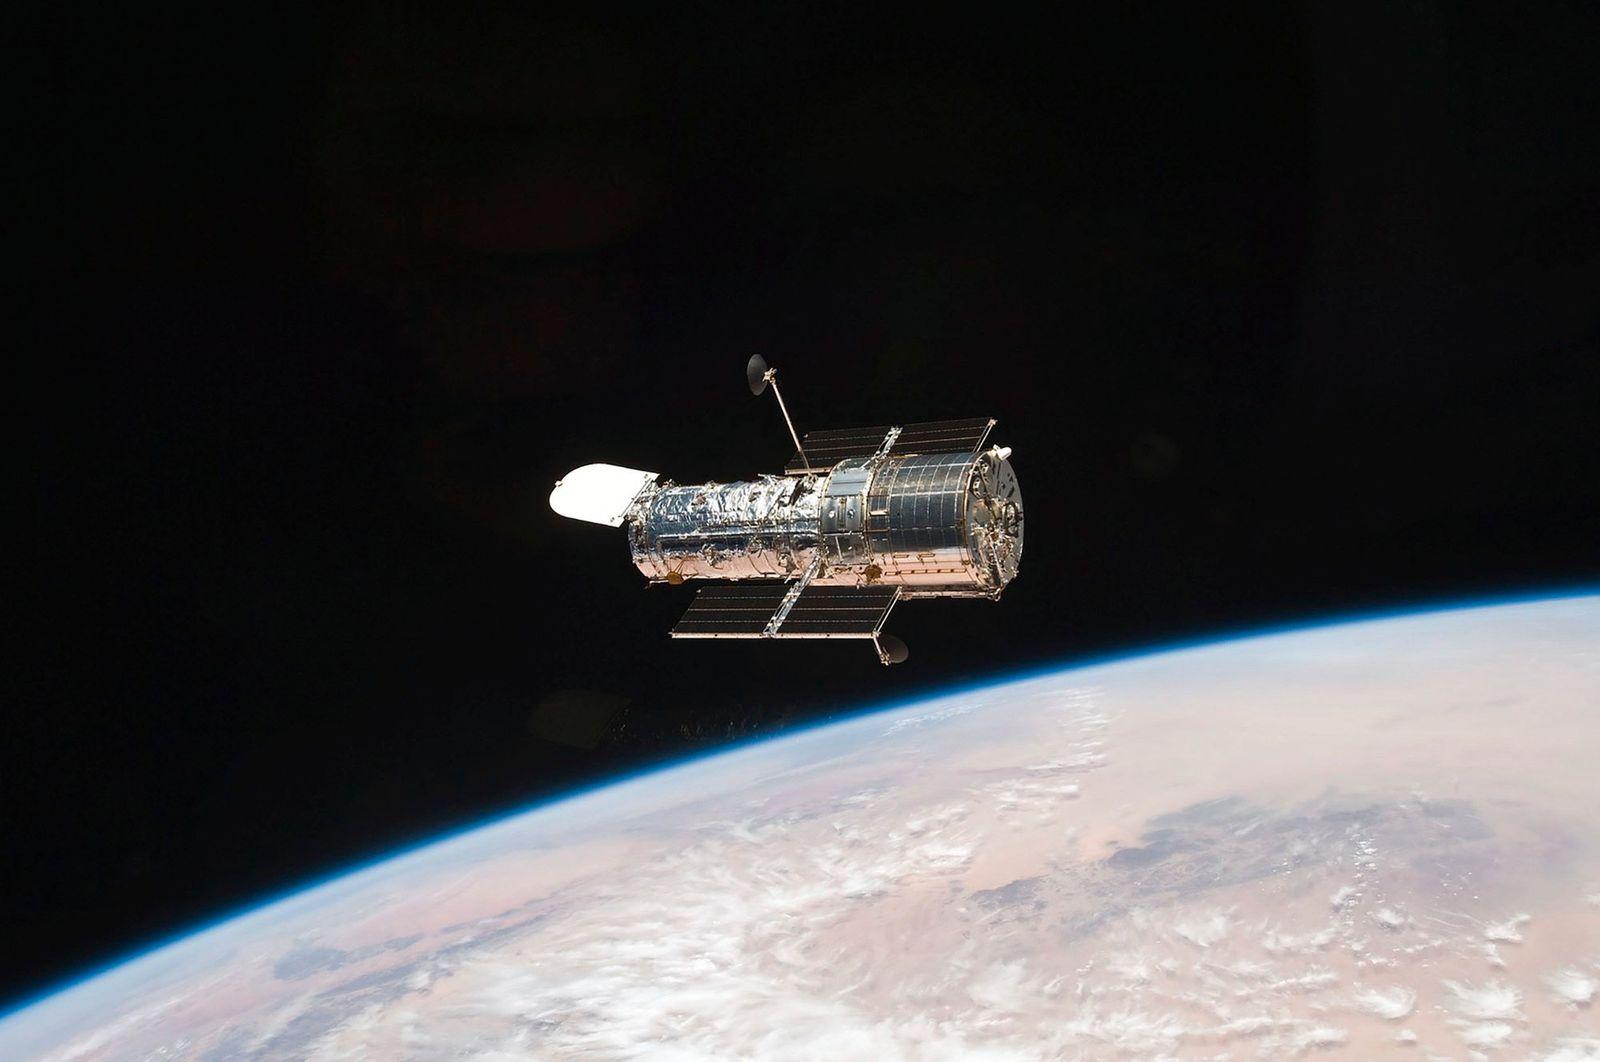 Hubble Space Telescope NASA's Hubble Space Telescope